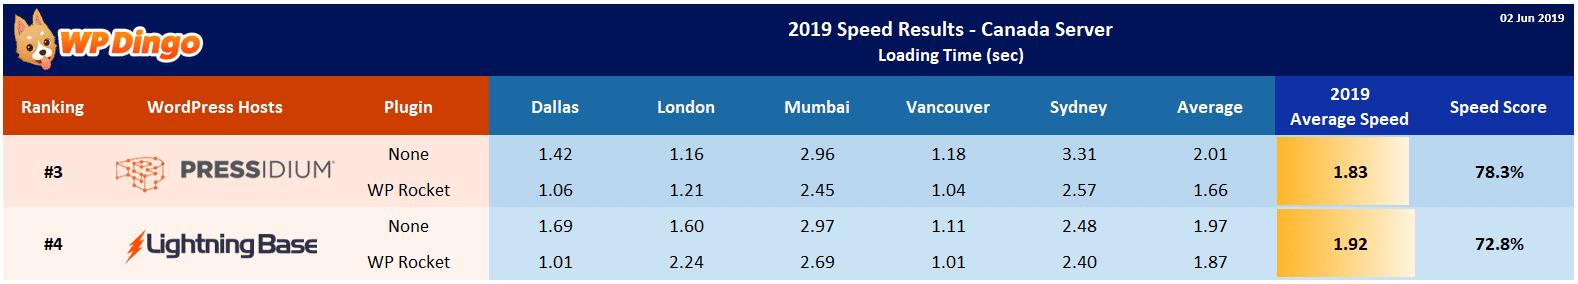 2019 Lightning Base vs Pressidium Speed Table - Canada Server